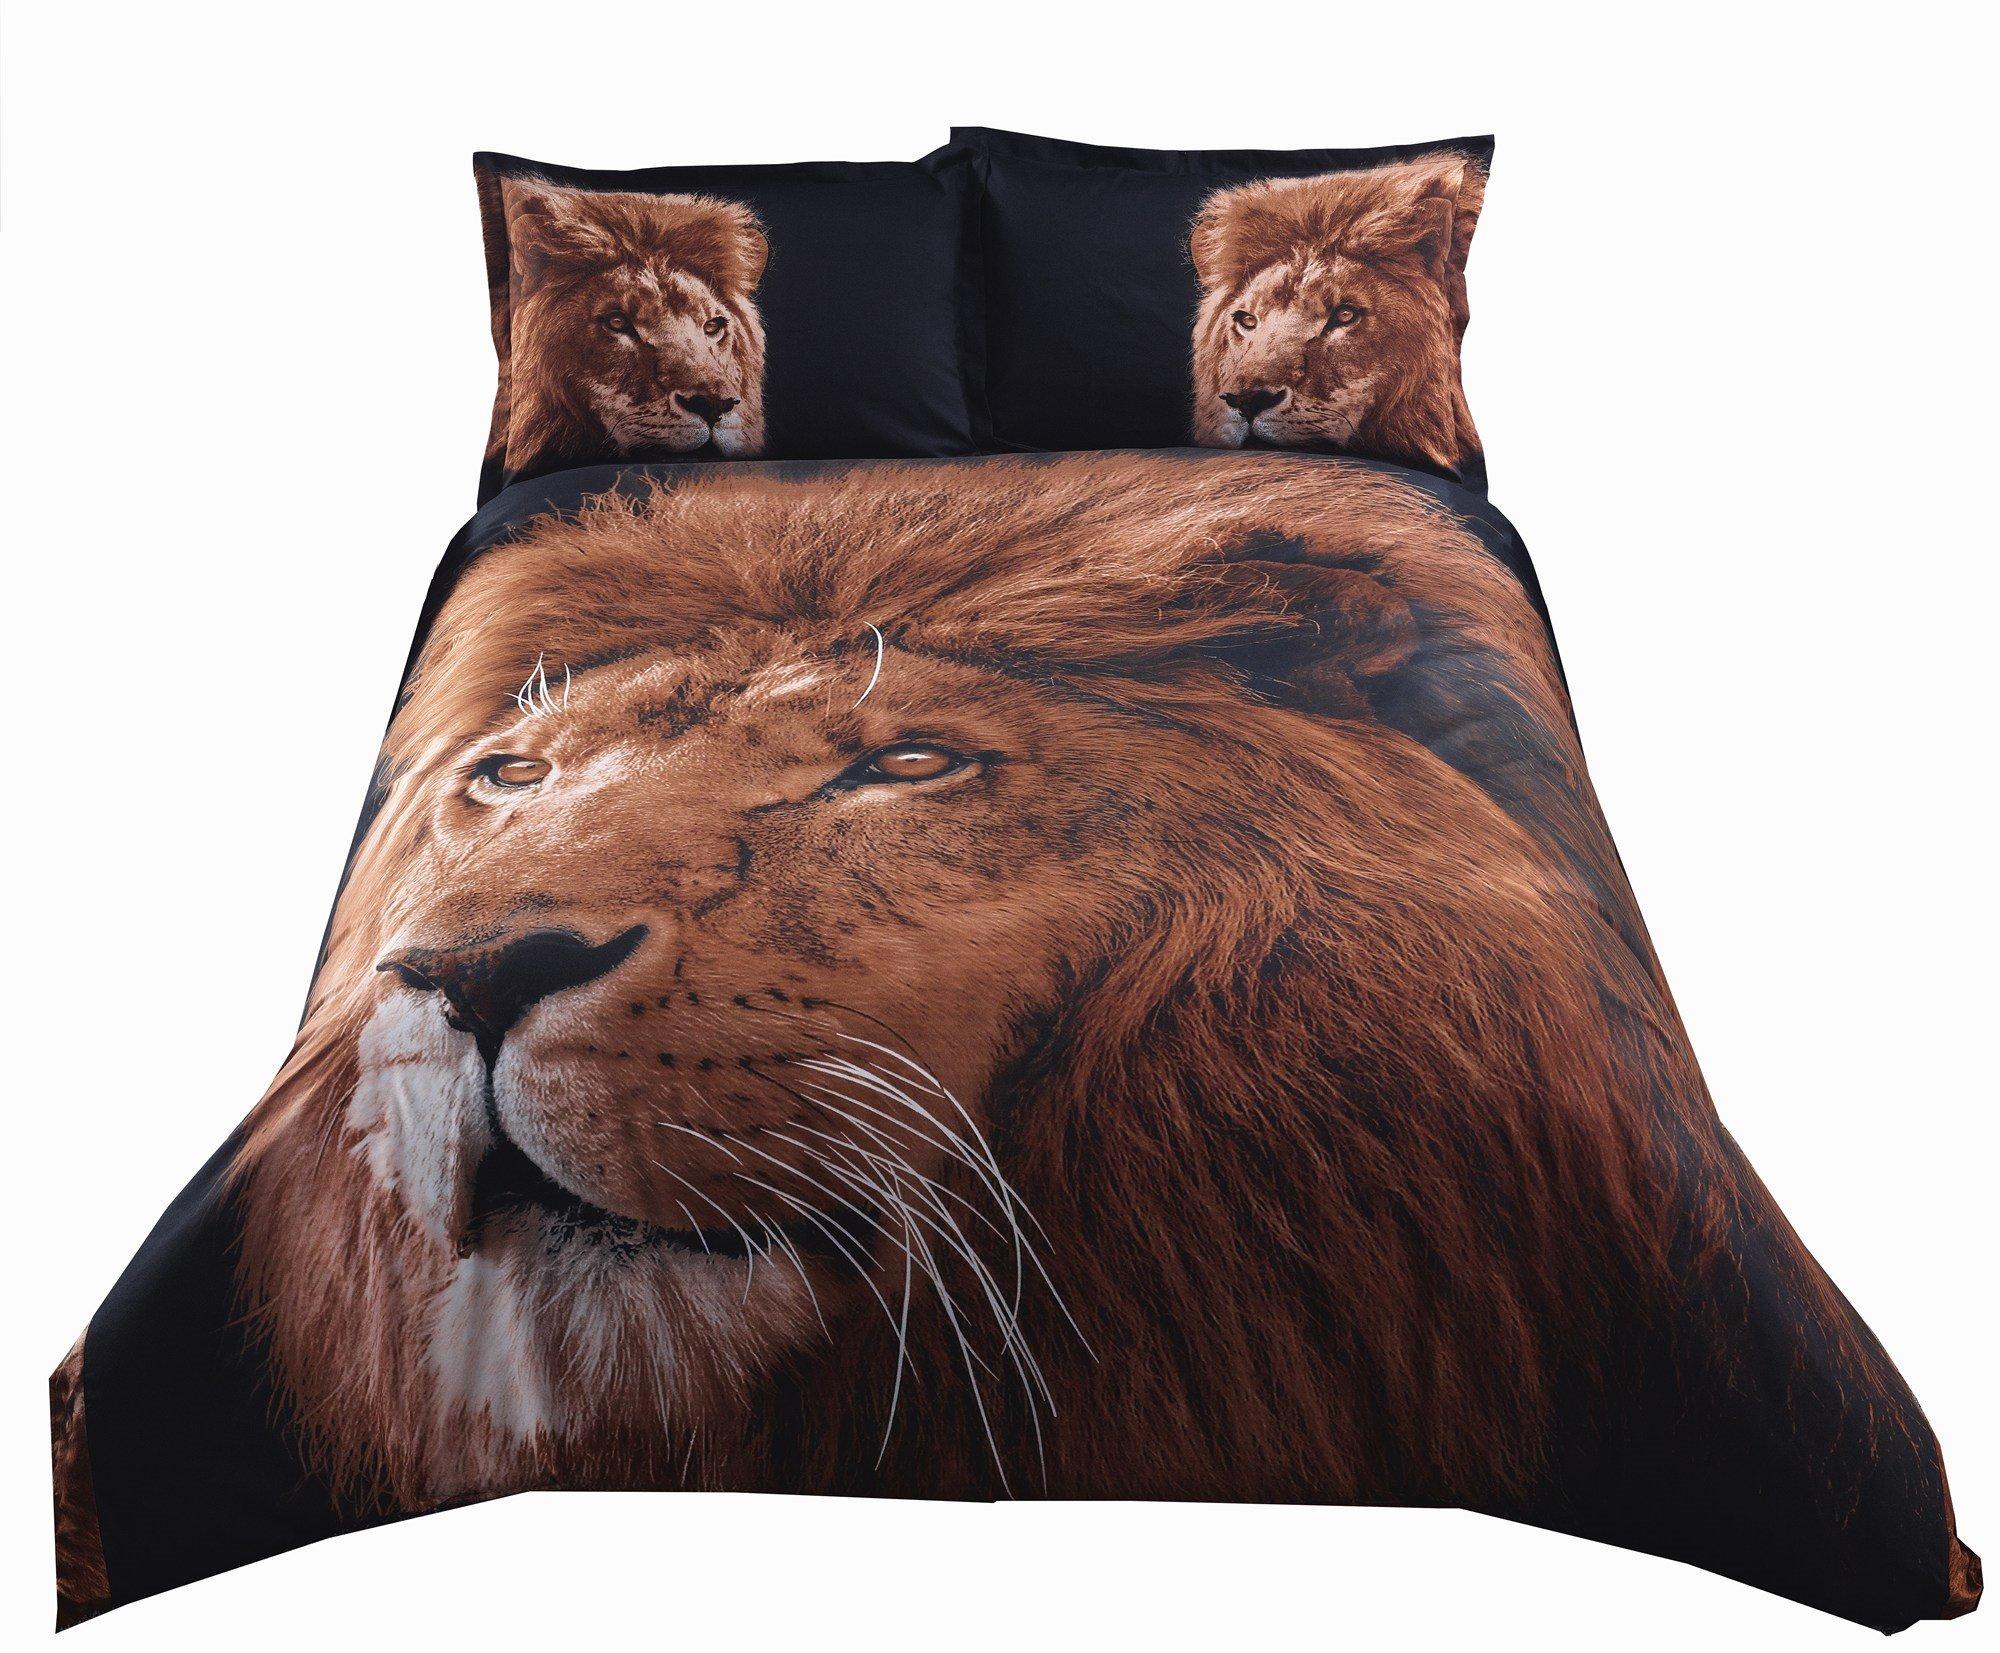 Inspiring Lion Print 4-Piece Polyester 3D Duvet Cover Sets